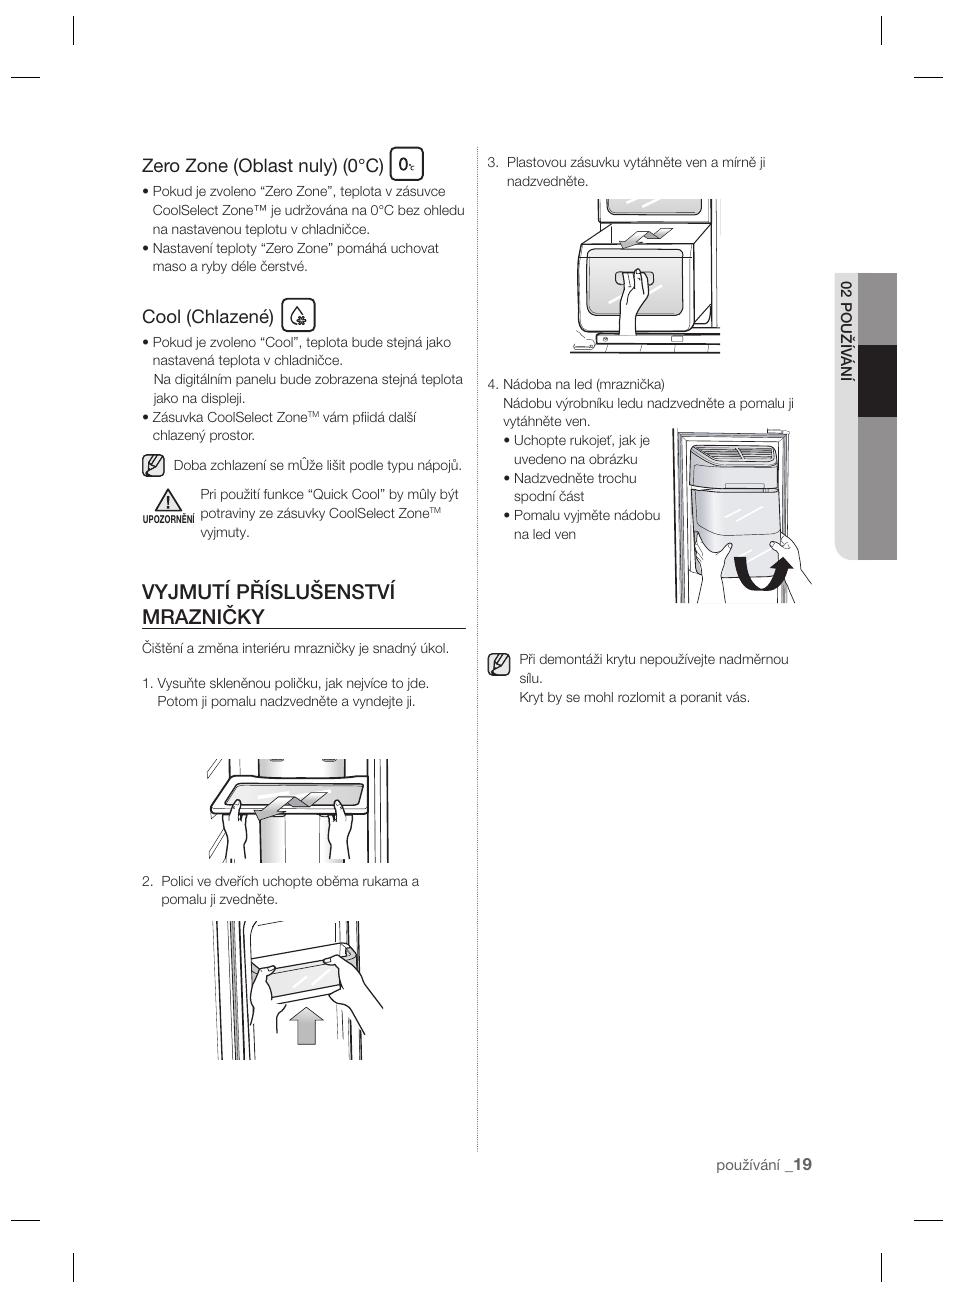 Zero Zone Freezer Wiring Diagram Electrical Diagrams Pri Services U2022 Refrigerator Components